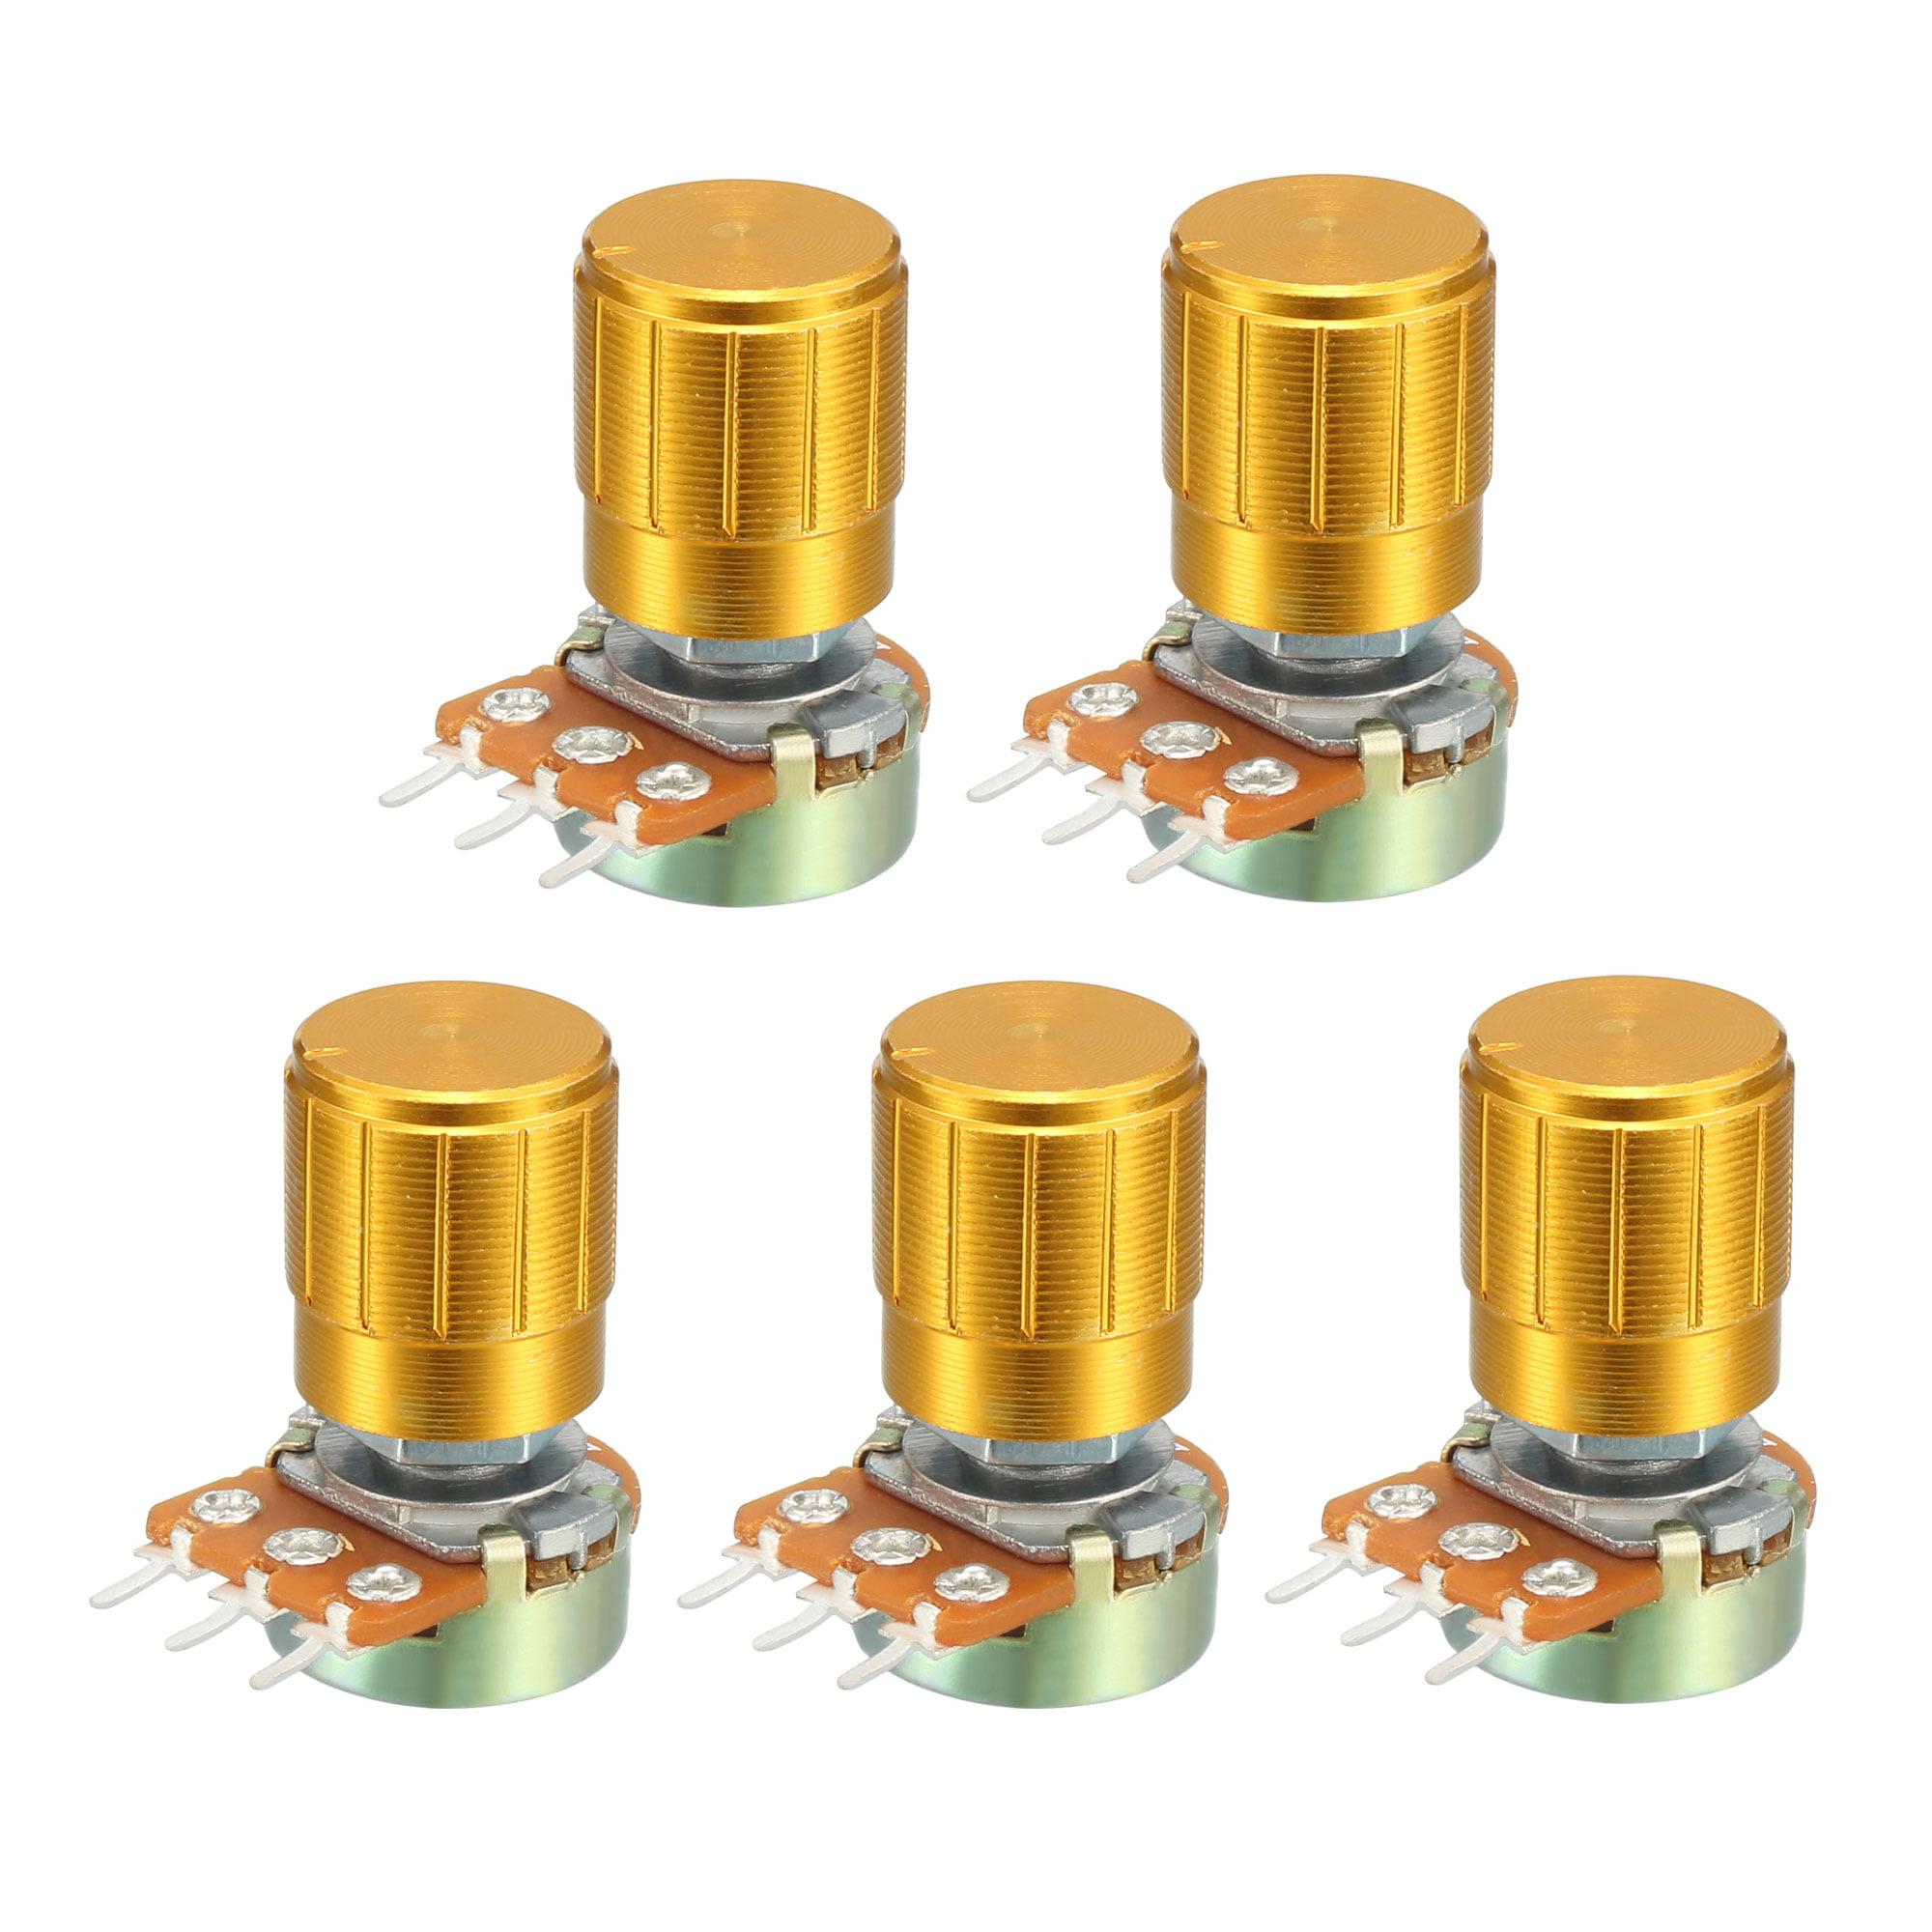 WH148 5K Ohm Variable Resistors Single Turn Rotary Carbon Film Taper Potentiometer W Knobs 5pcs